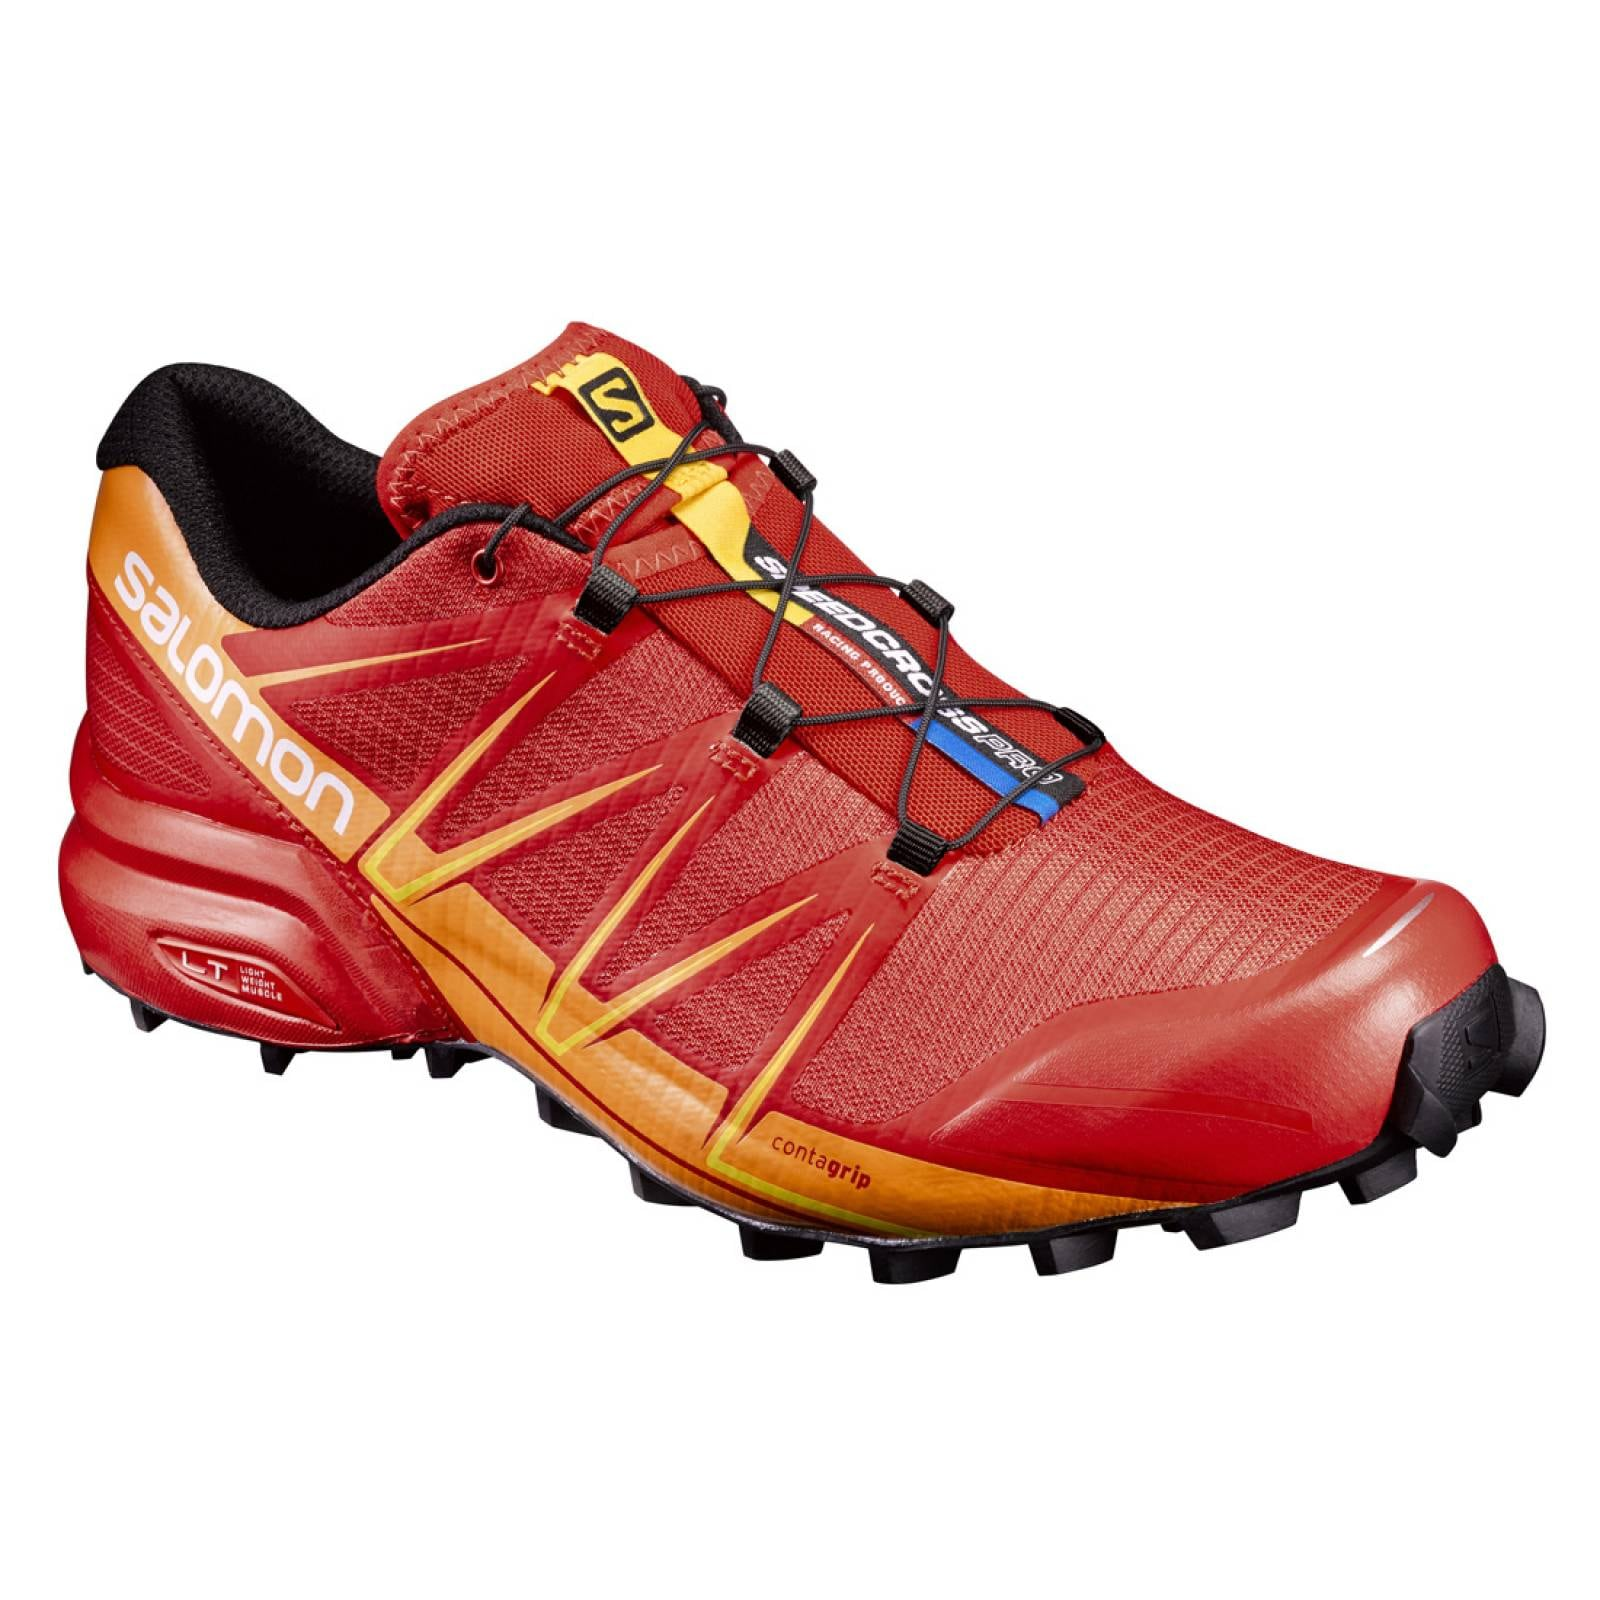 a184b7e8767 Tenis hombre salomon trail running speedcross pro rojo